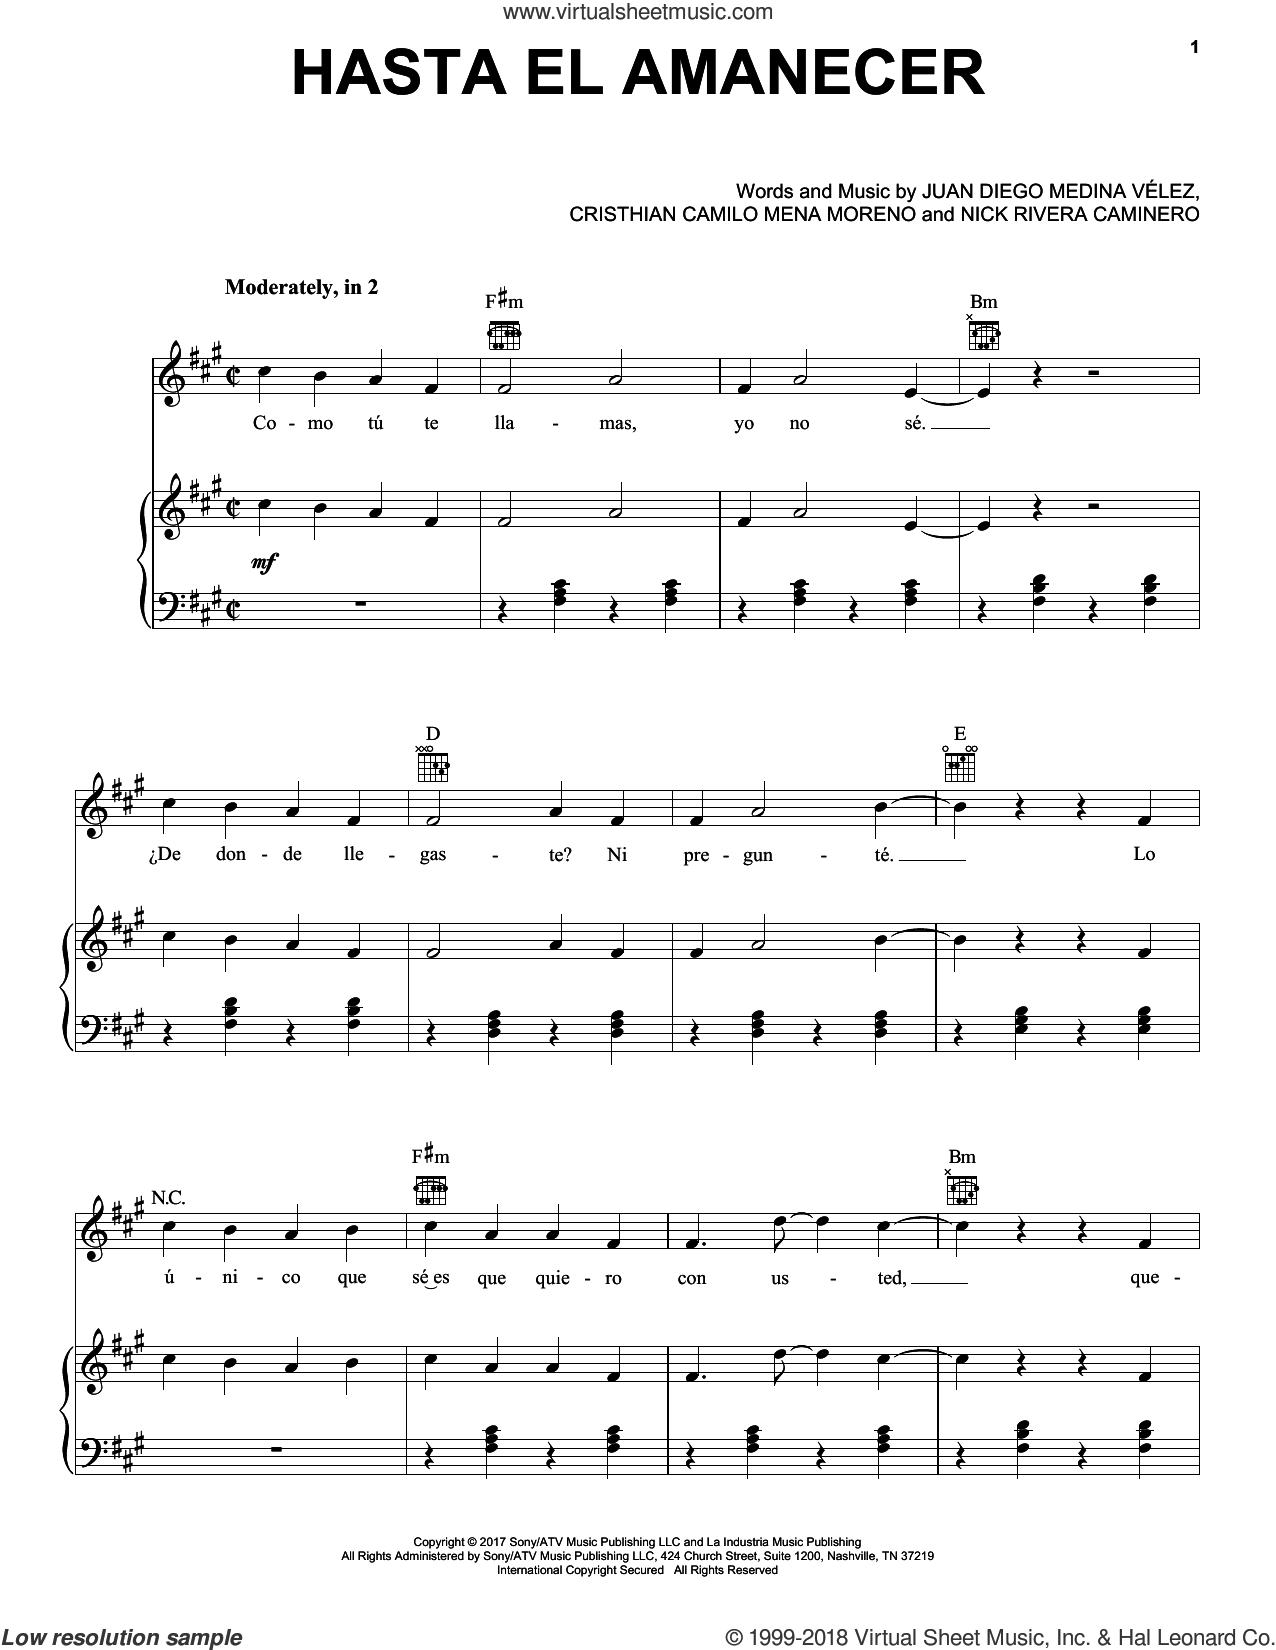 Hasta El Amanecer sheet music for voice, piano or guitar by Nicky Jam, Cristhian Camilo Mena Moreno, Juan Diego Medina Velez and Nick Rivera Caminero, intermediate skill level